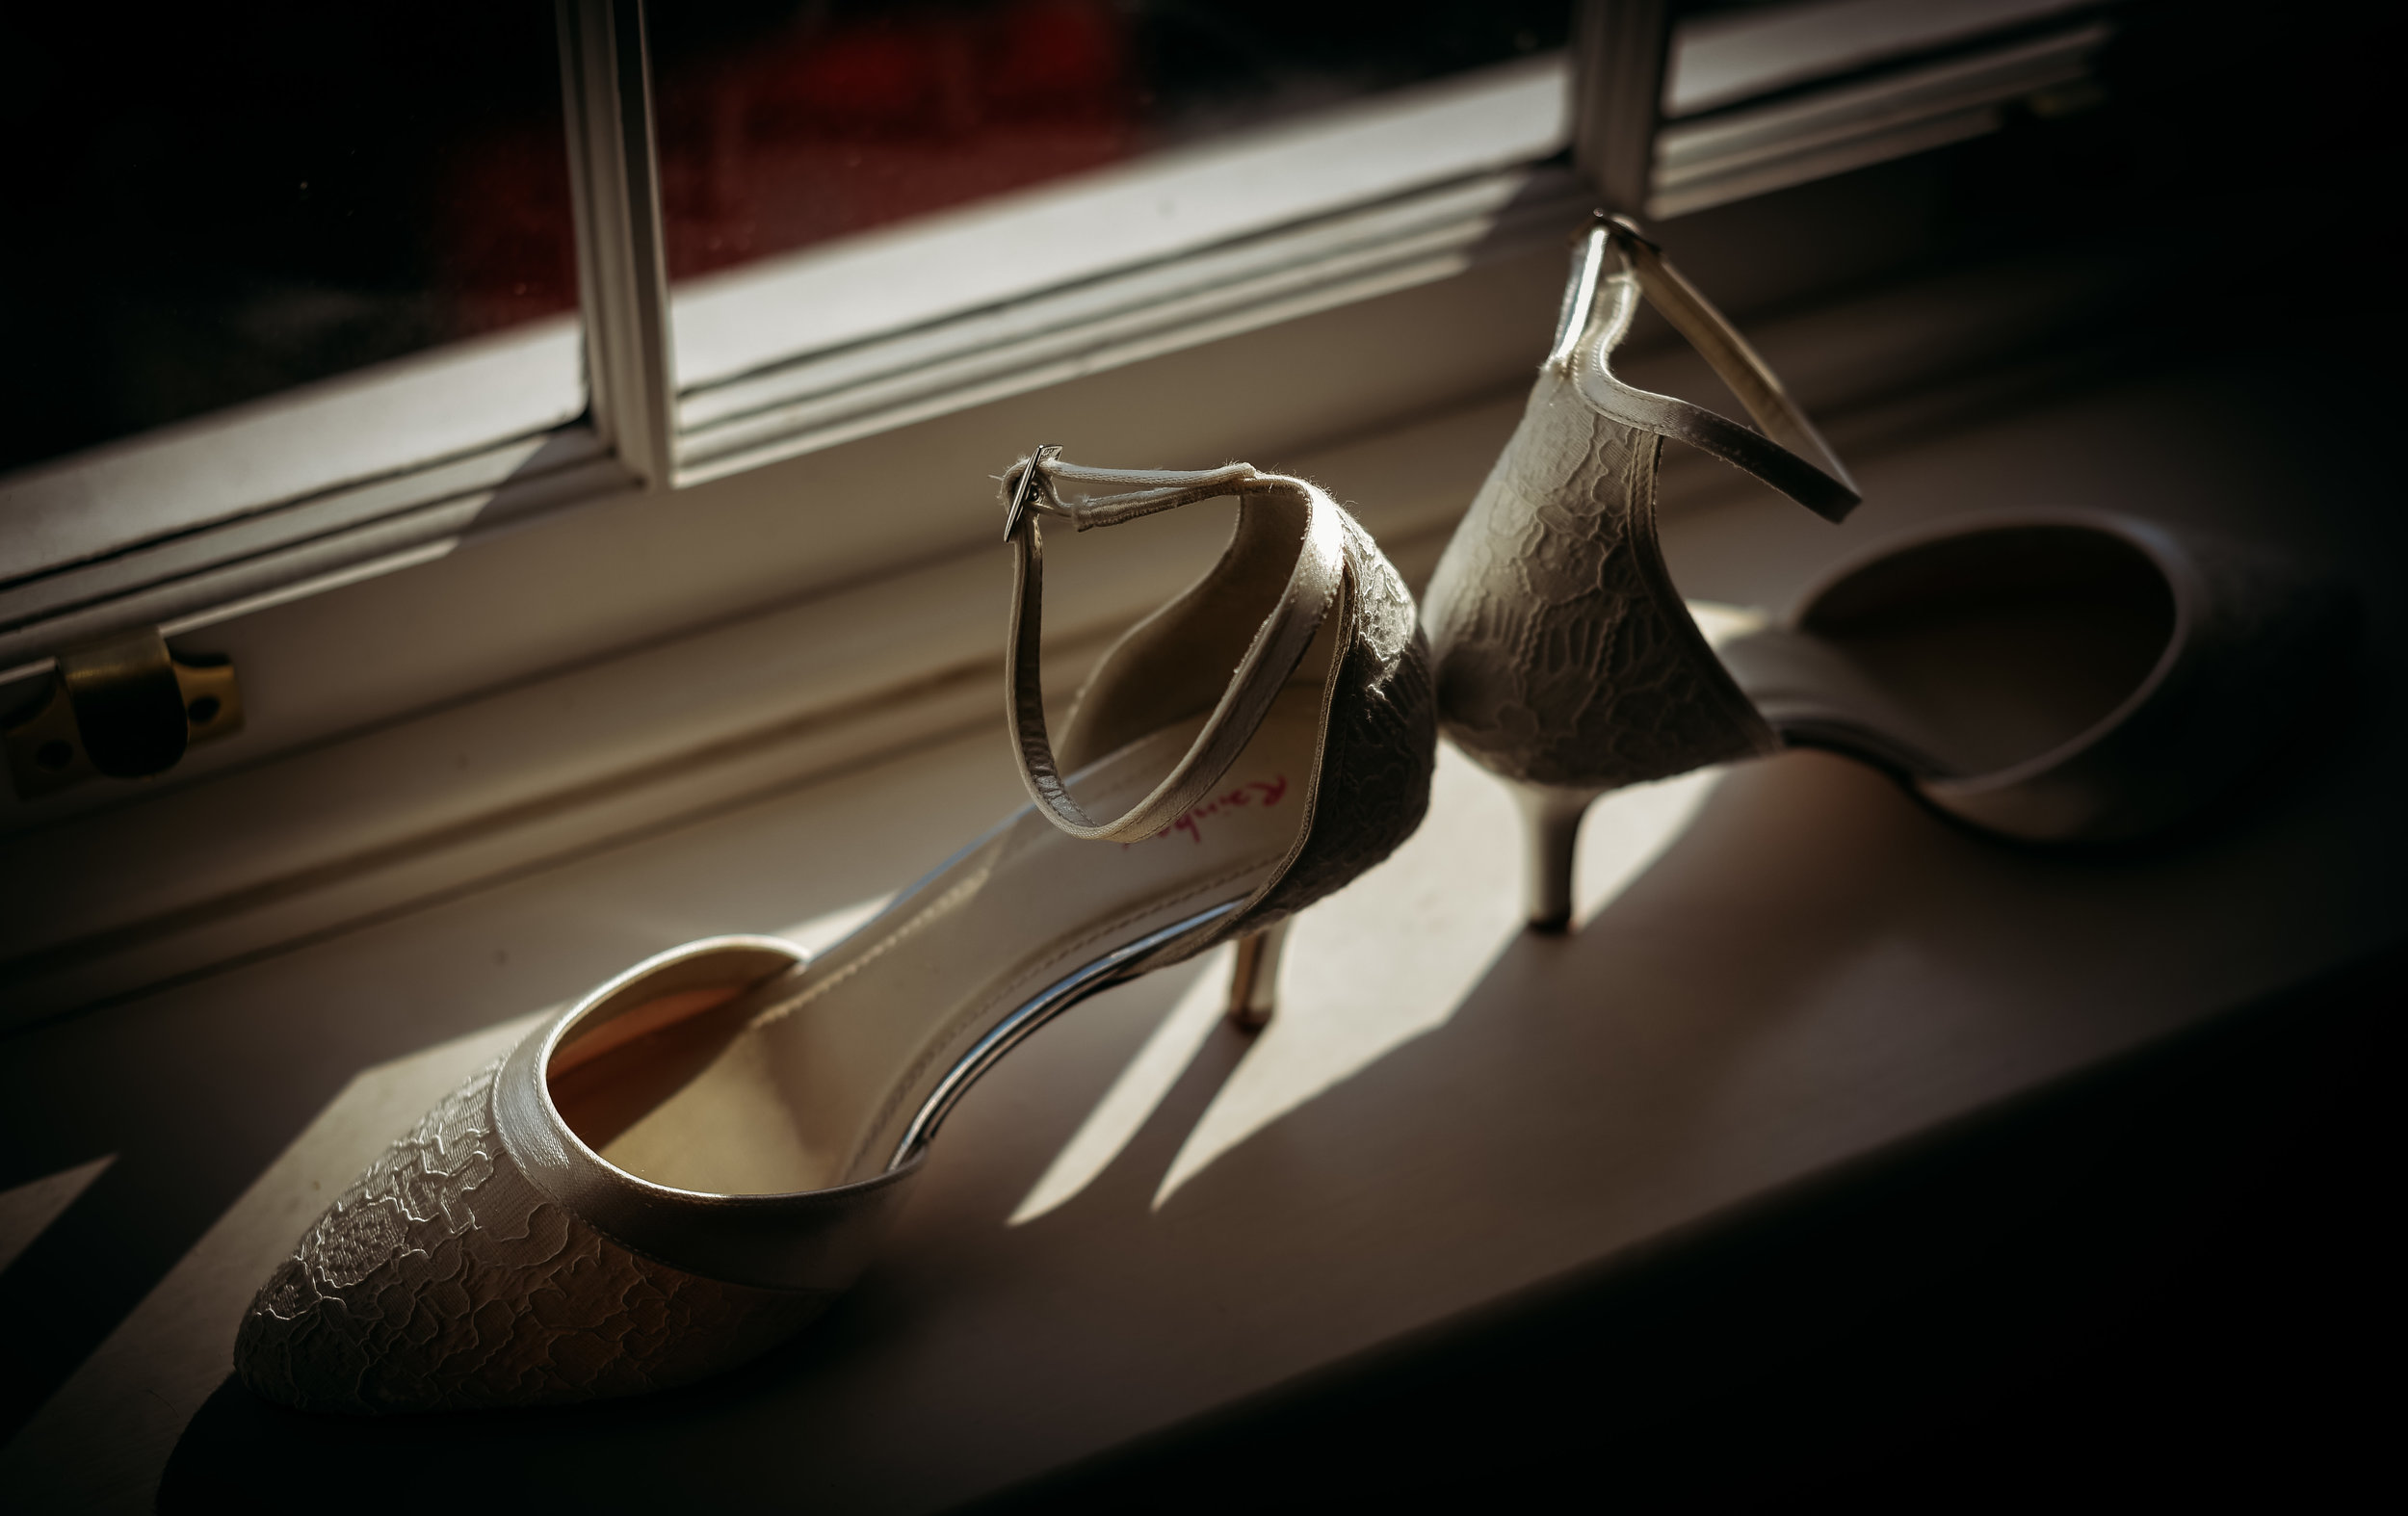 001Shoes.jpg